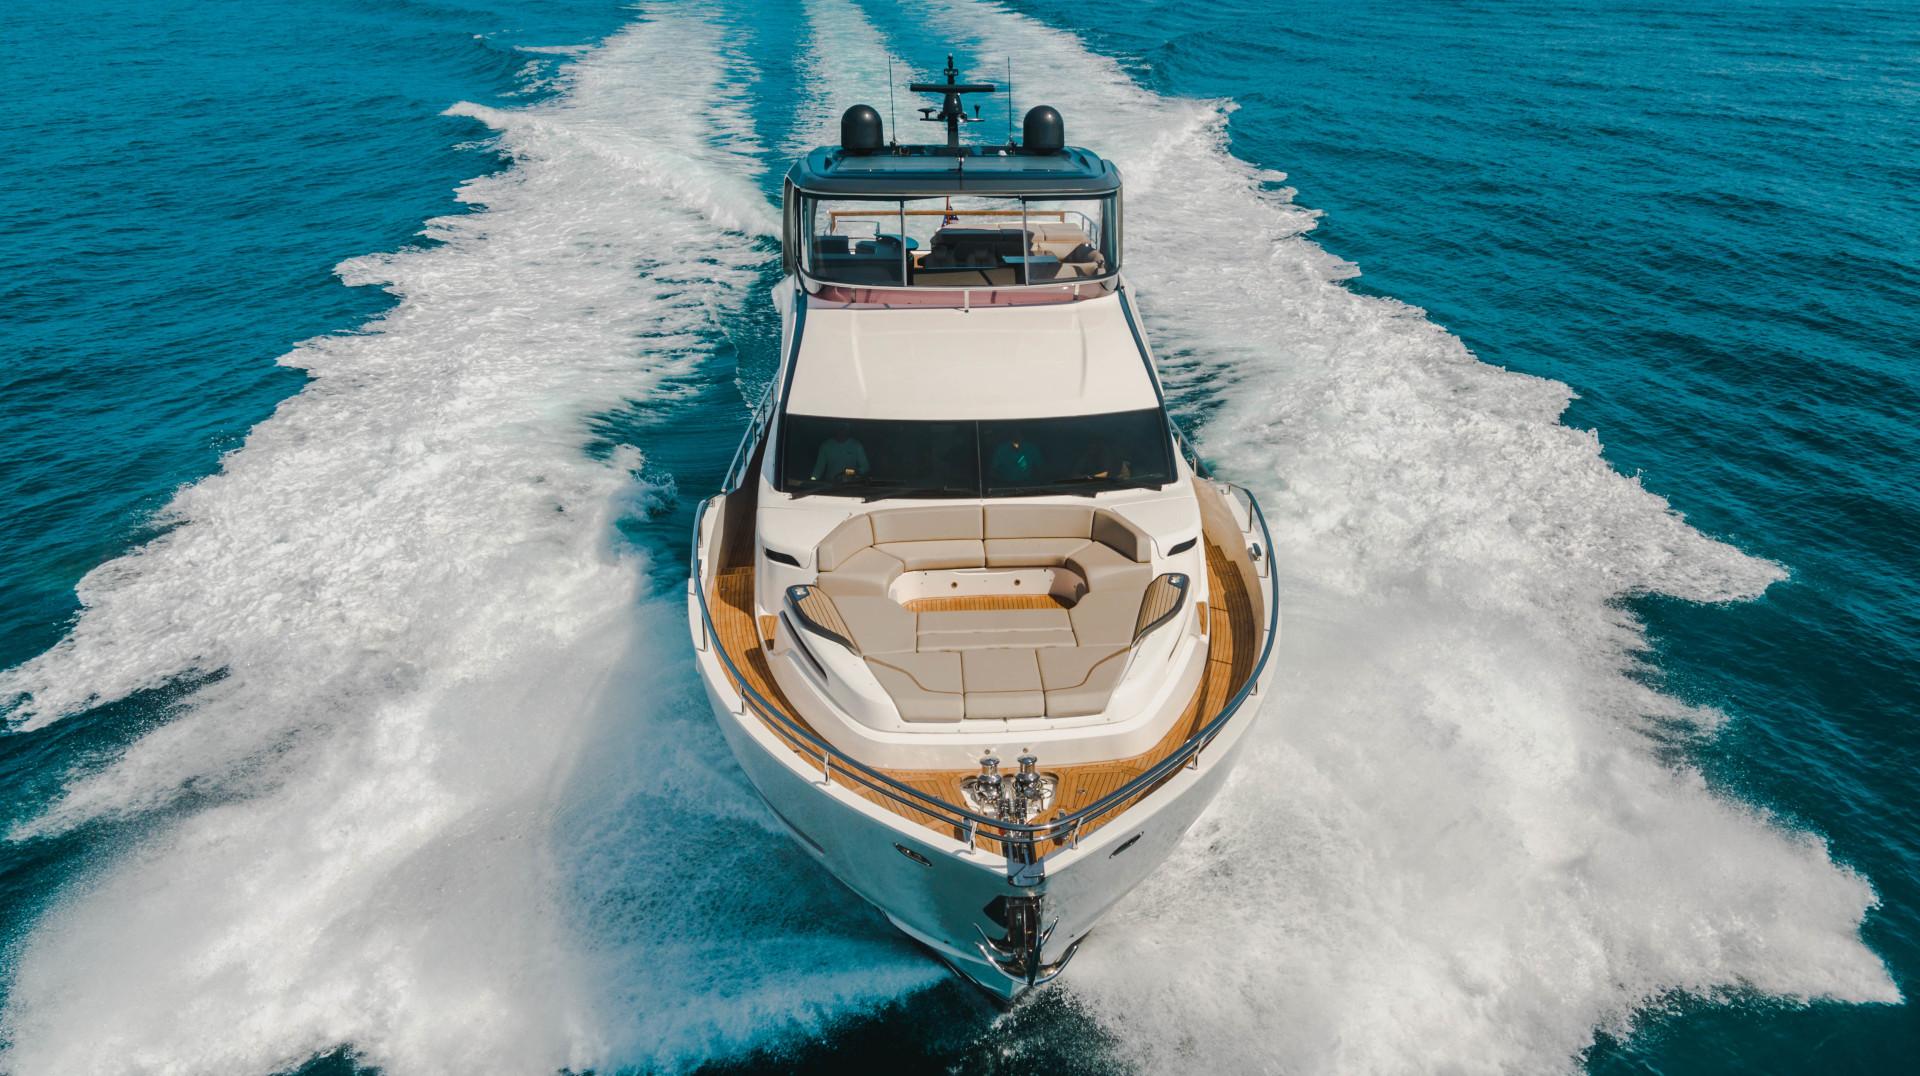 Princess-Y85  2019-Splash Delray Beach-Florida-United States-1631610 | Thumbnail